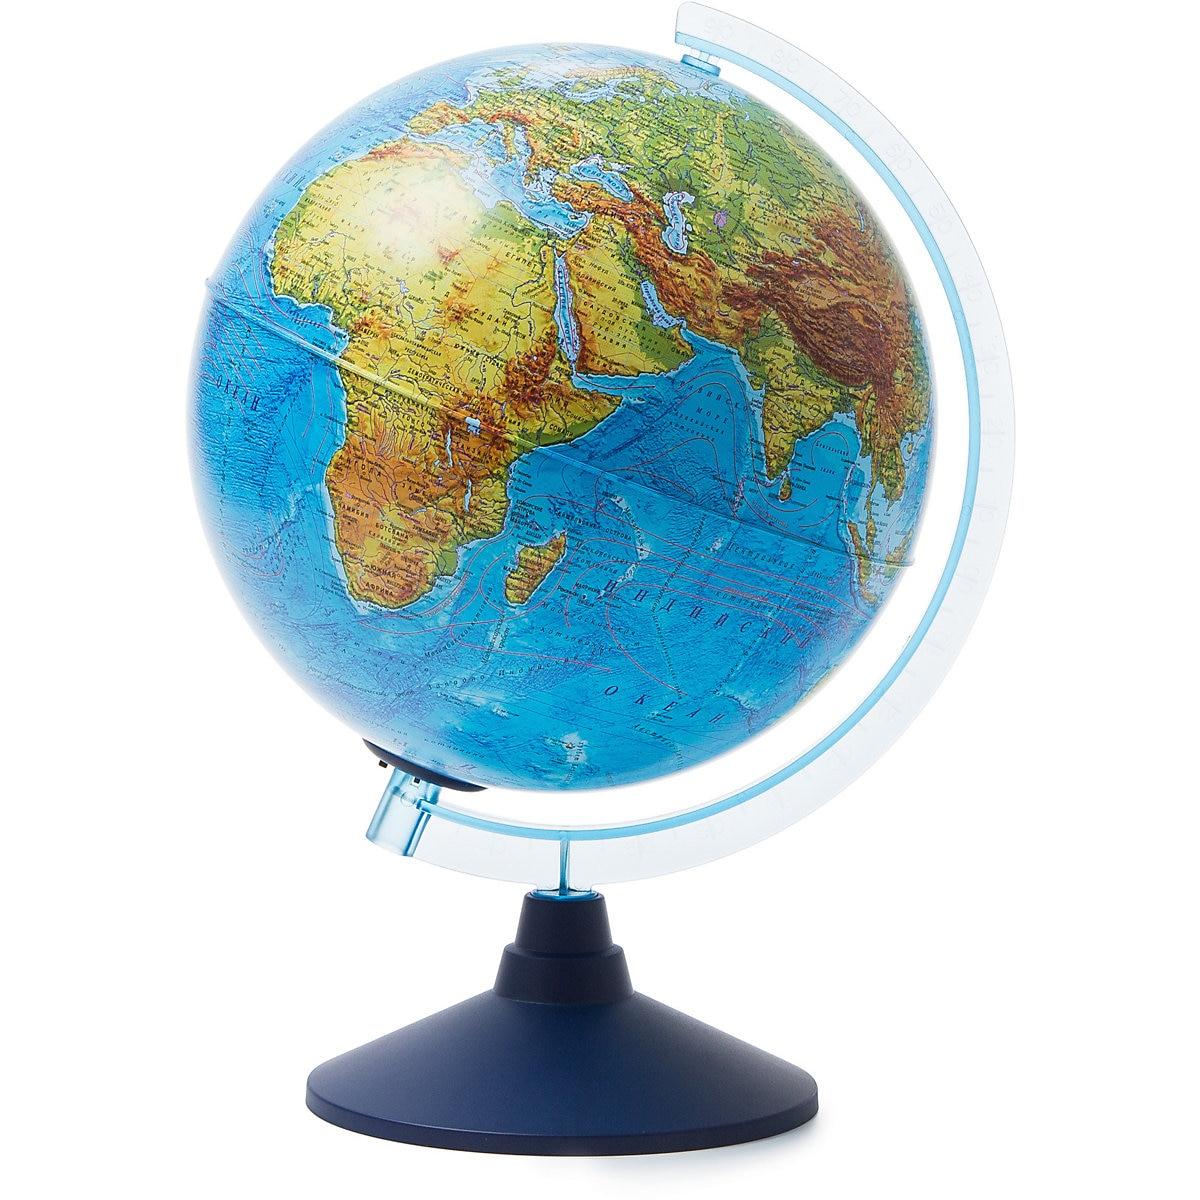 GLOBEN Desk Set 7327231 Globe Accessories Organizer For Office And School Schools Offices MTpromo